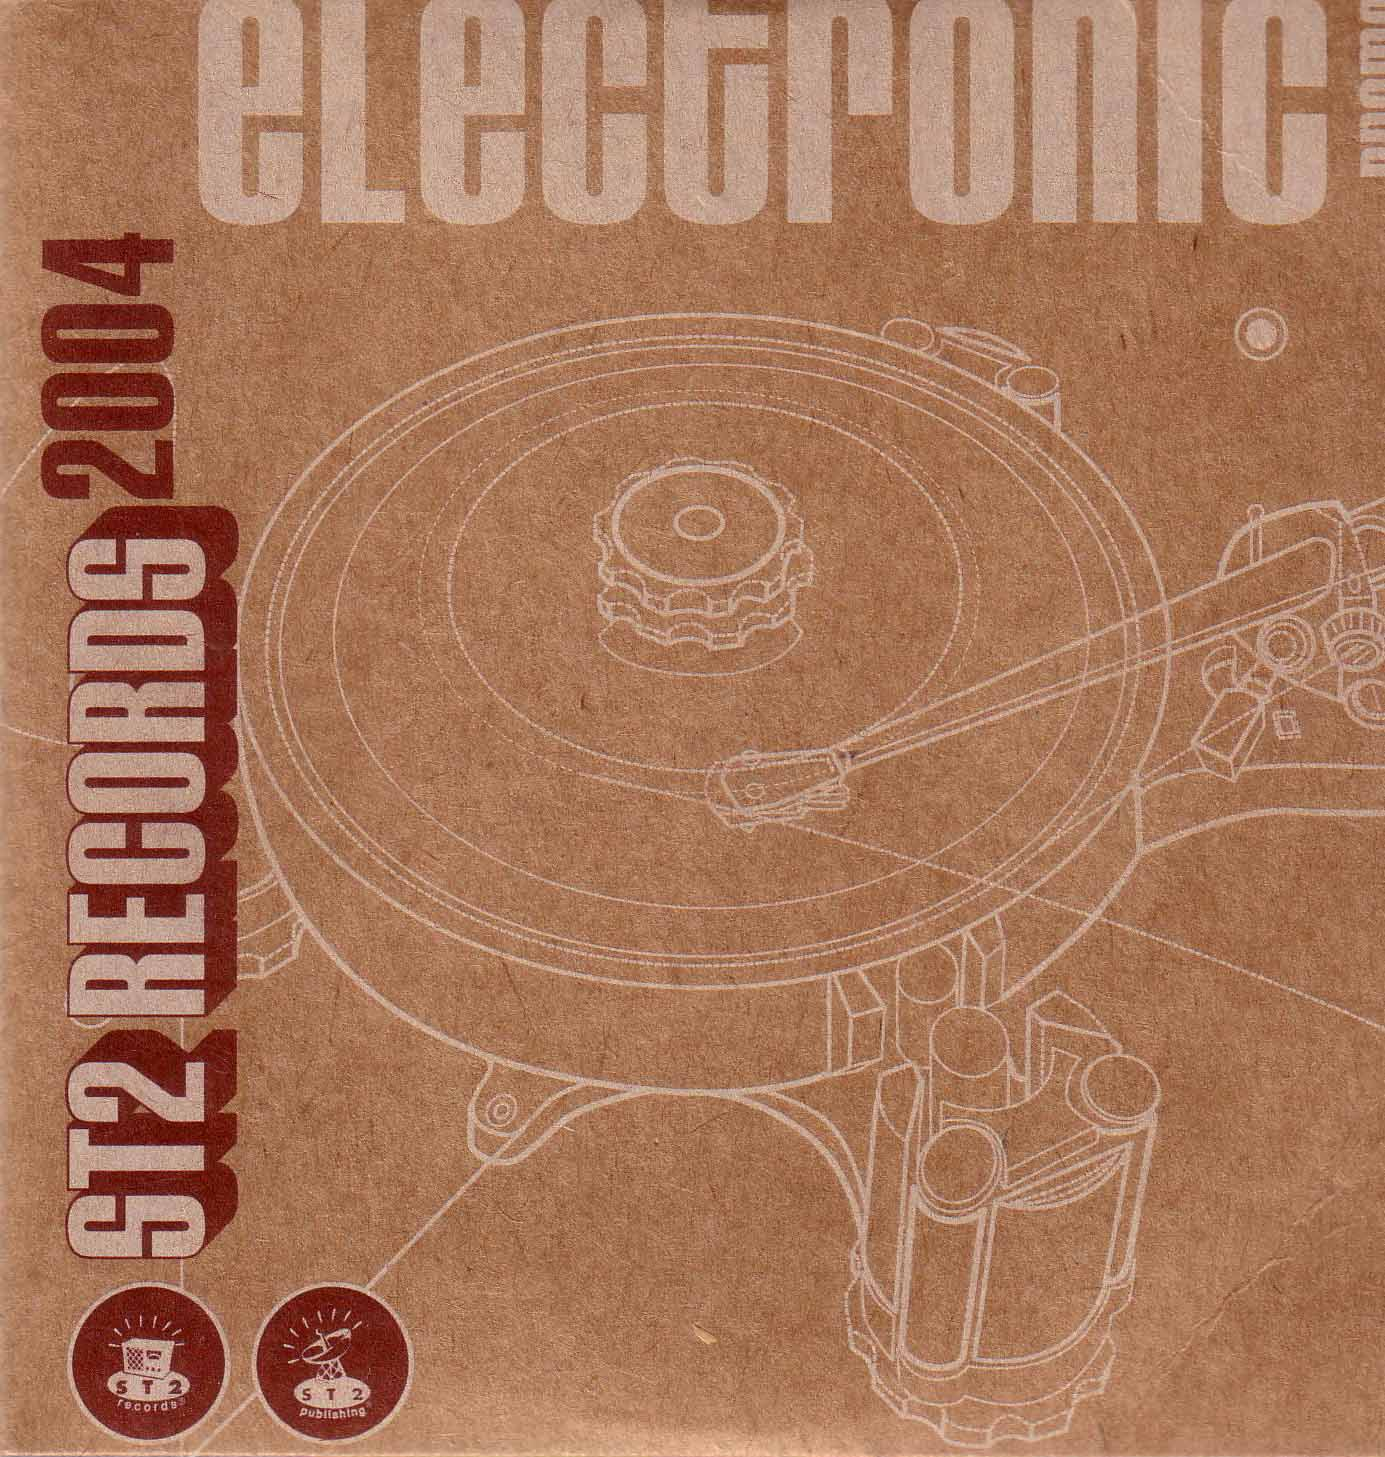 ST2 Eletronic 2004